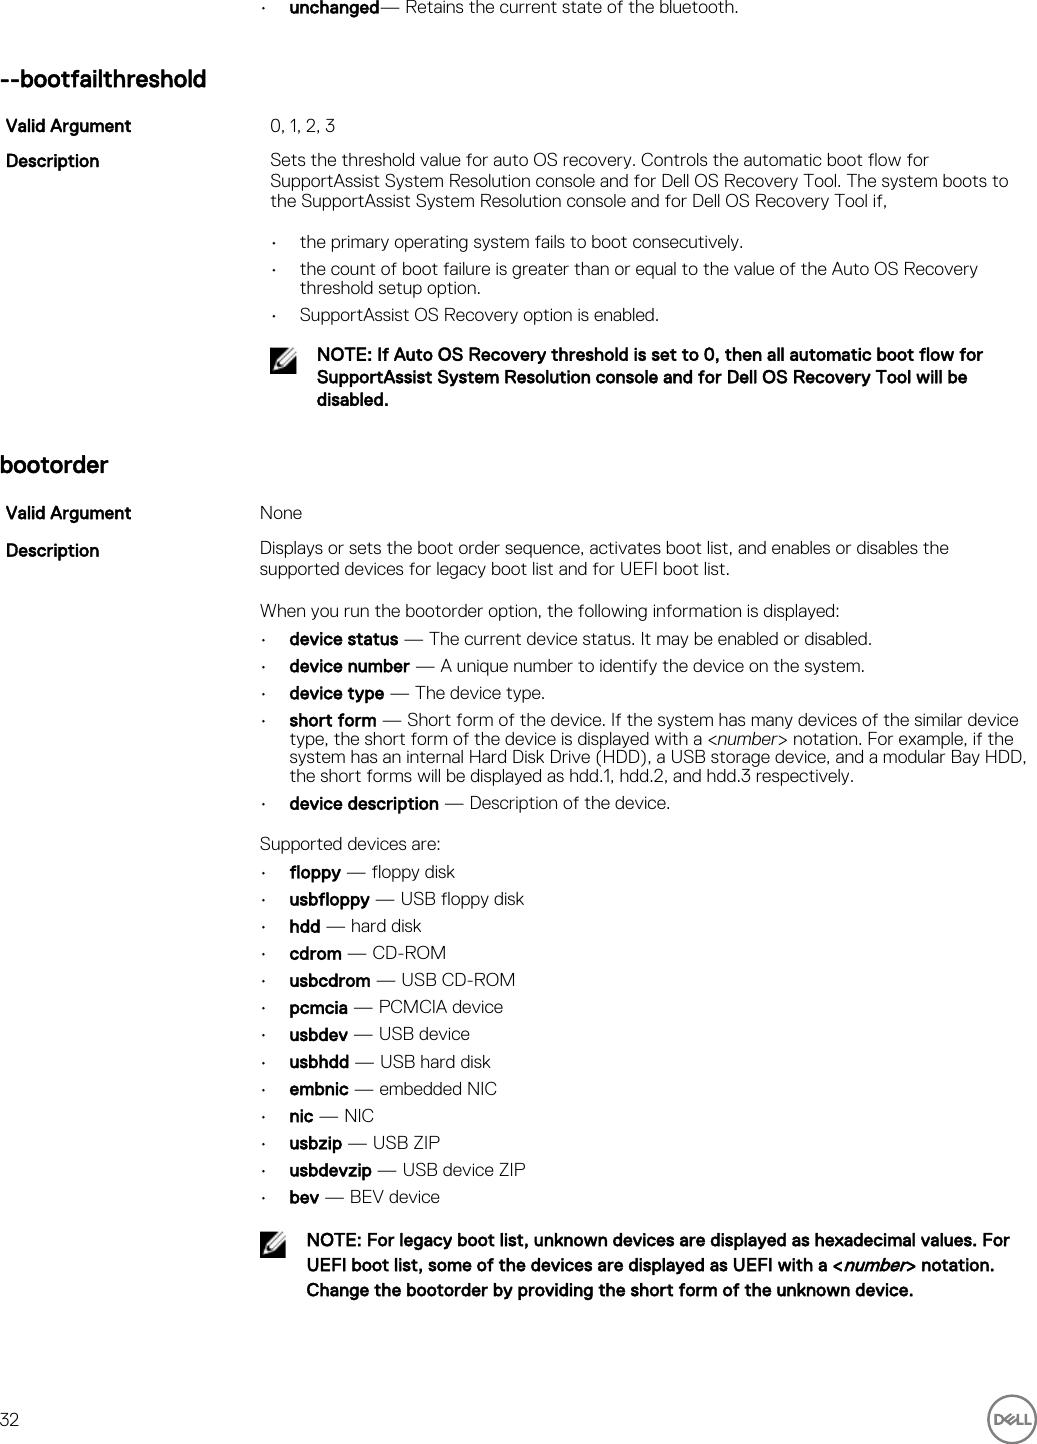 Dell Command | Configure Version 3 2 Line Interface